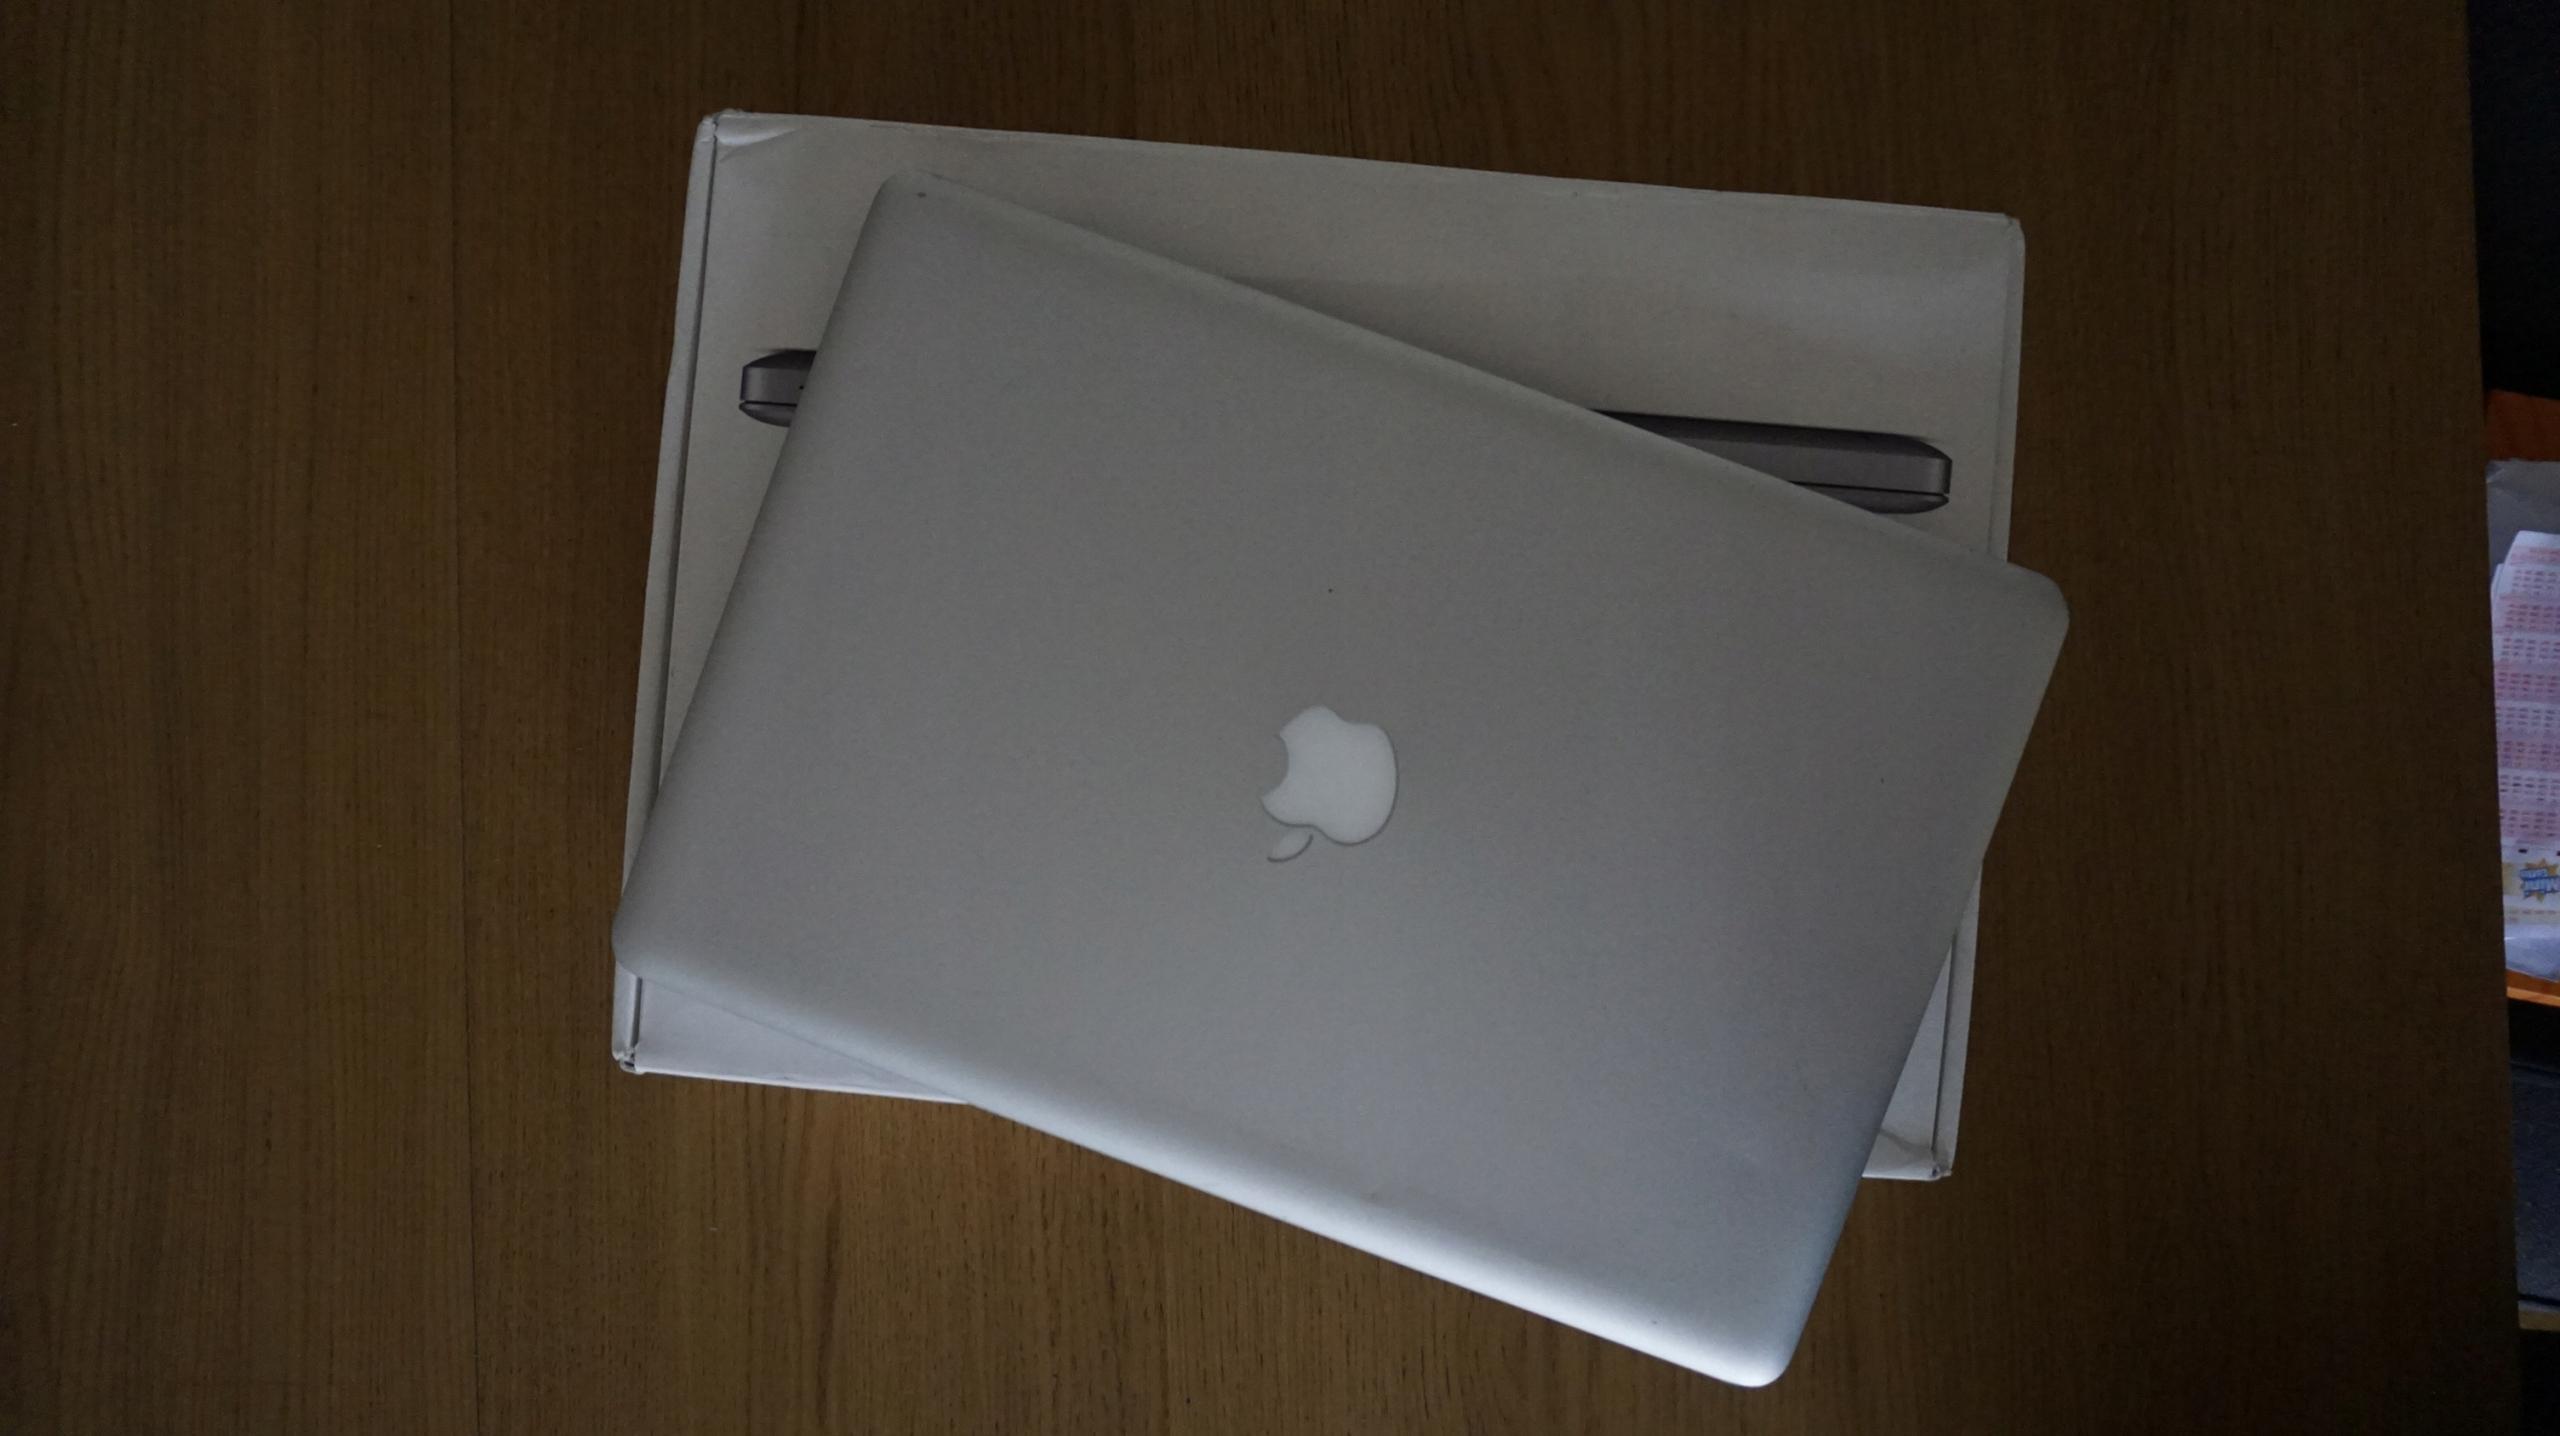 Apple Macbook Pro6,2 15'' i5, (mid2010)